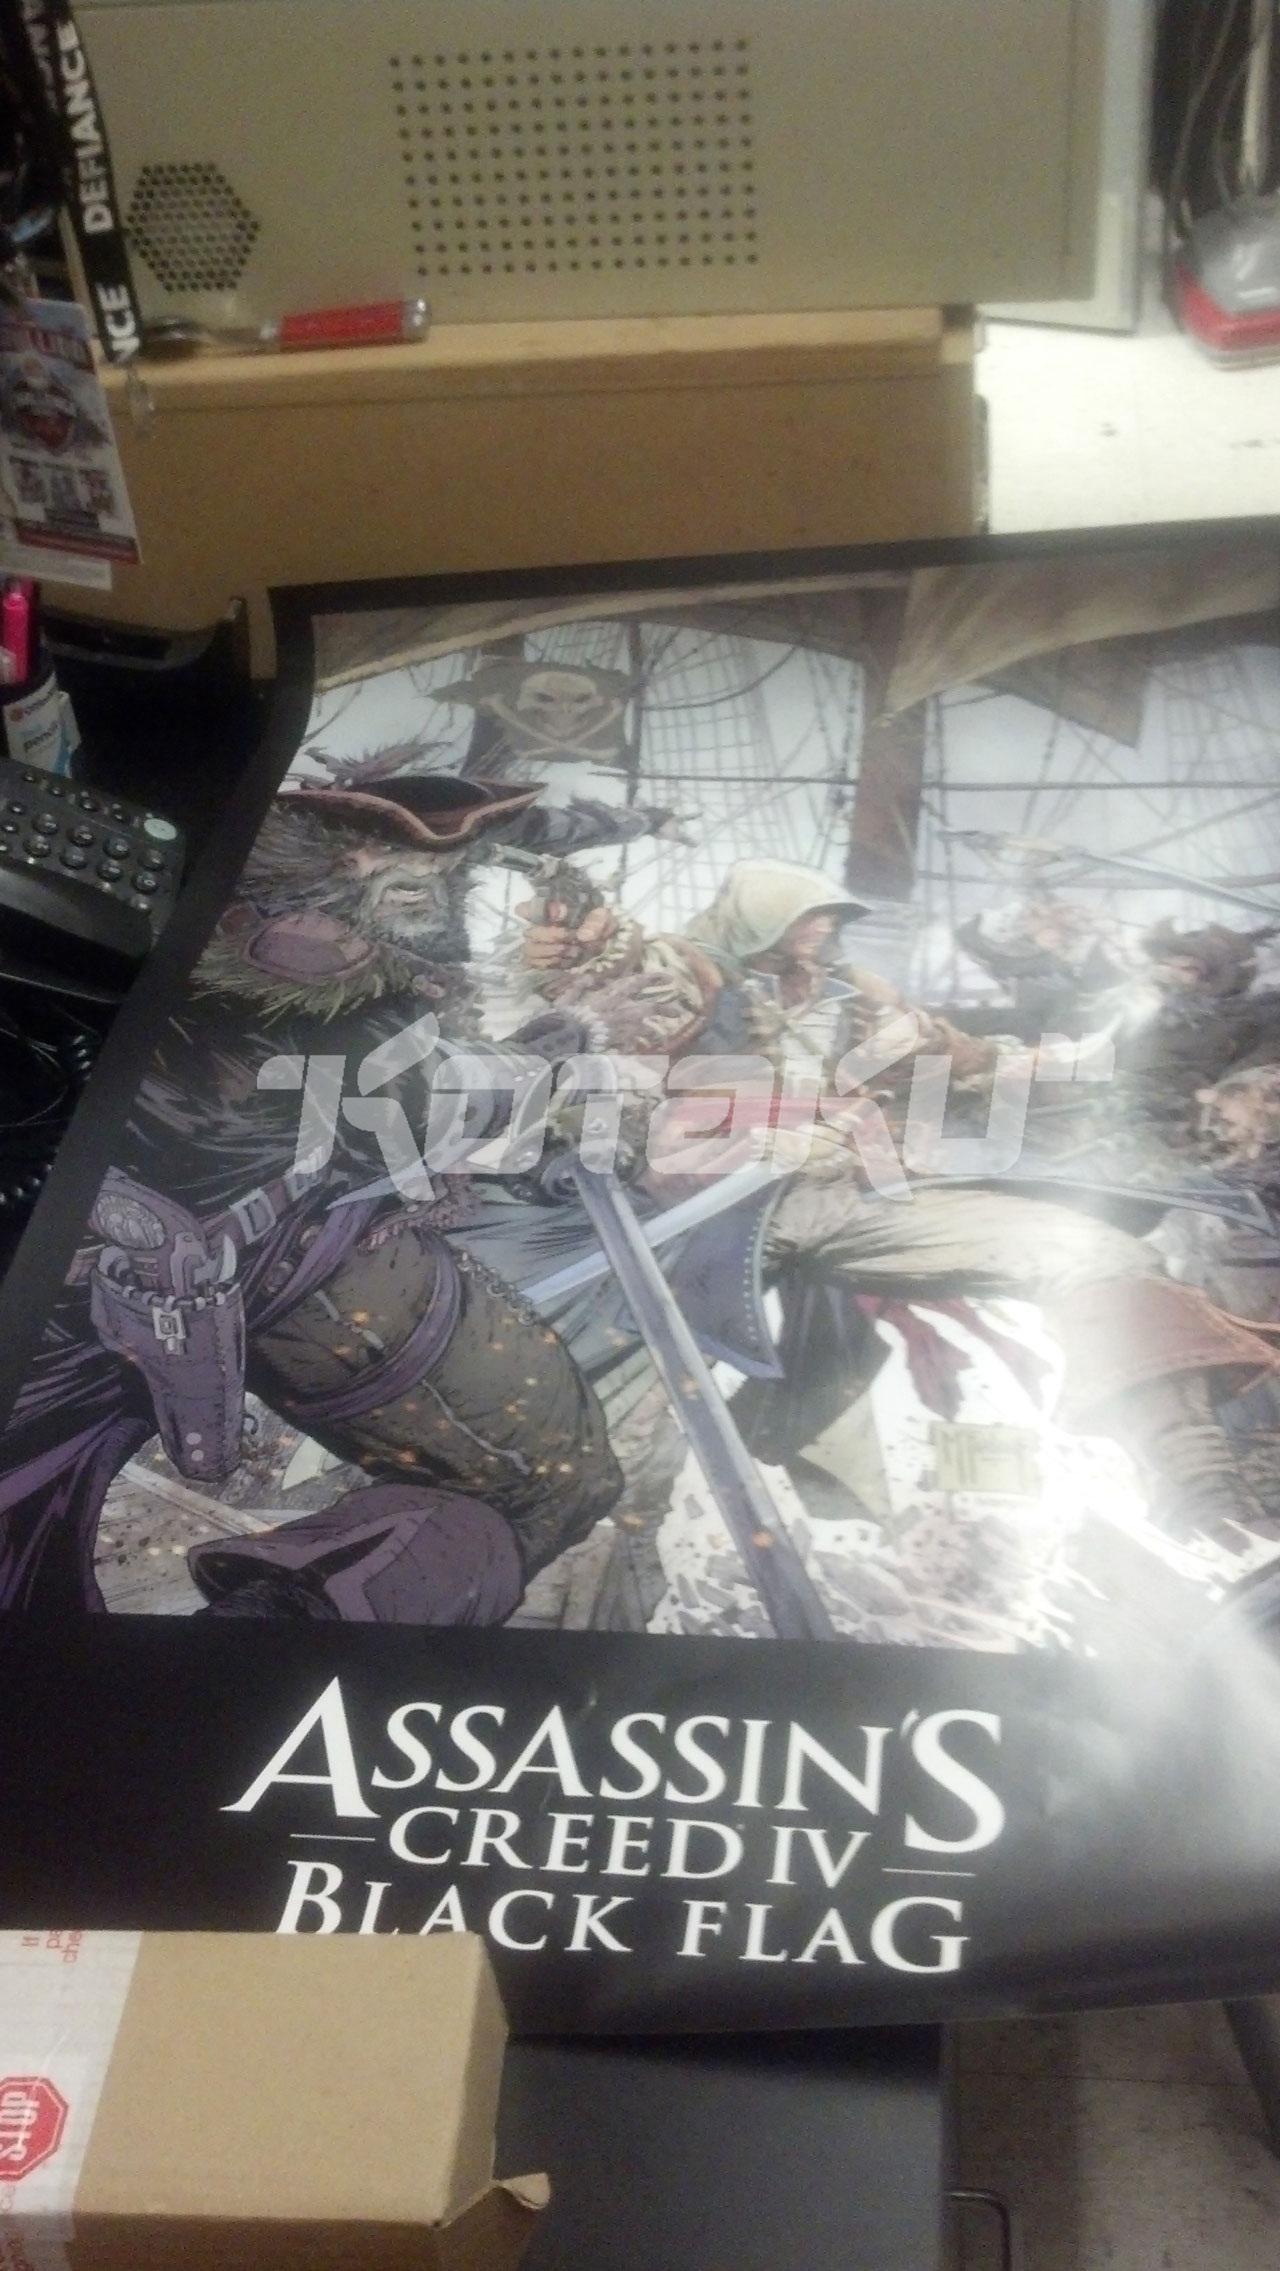 Assassins Creed IV: Black Flag – Ankündigung für Montag geplant